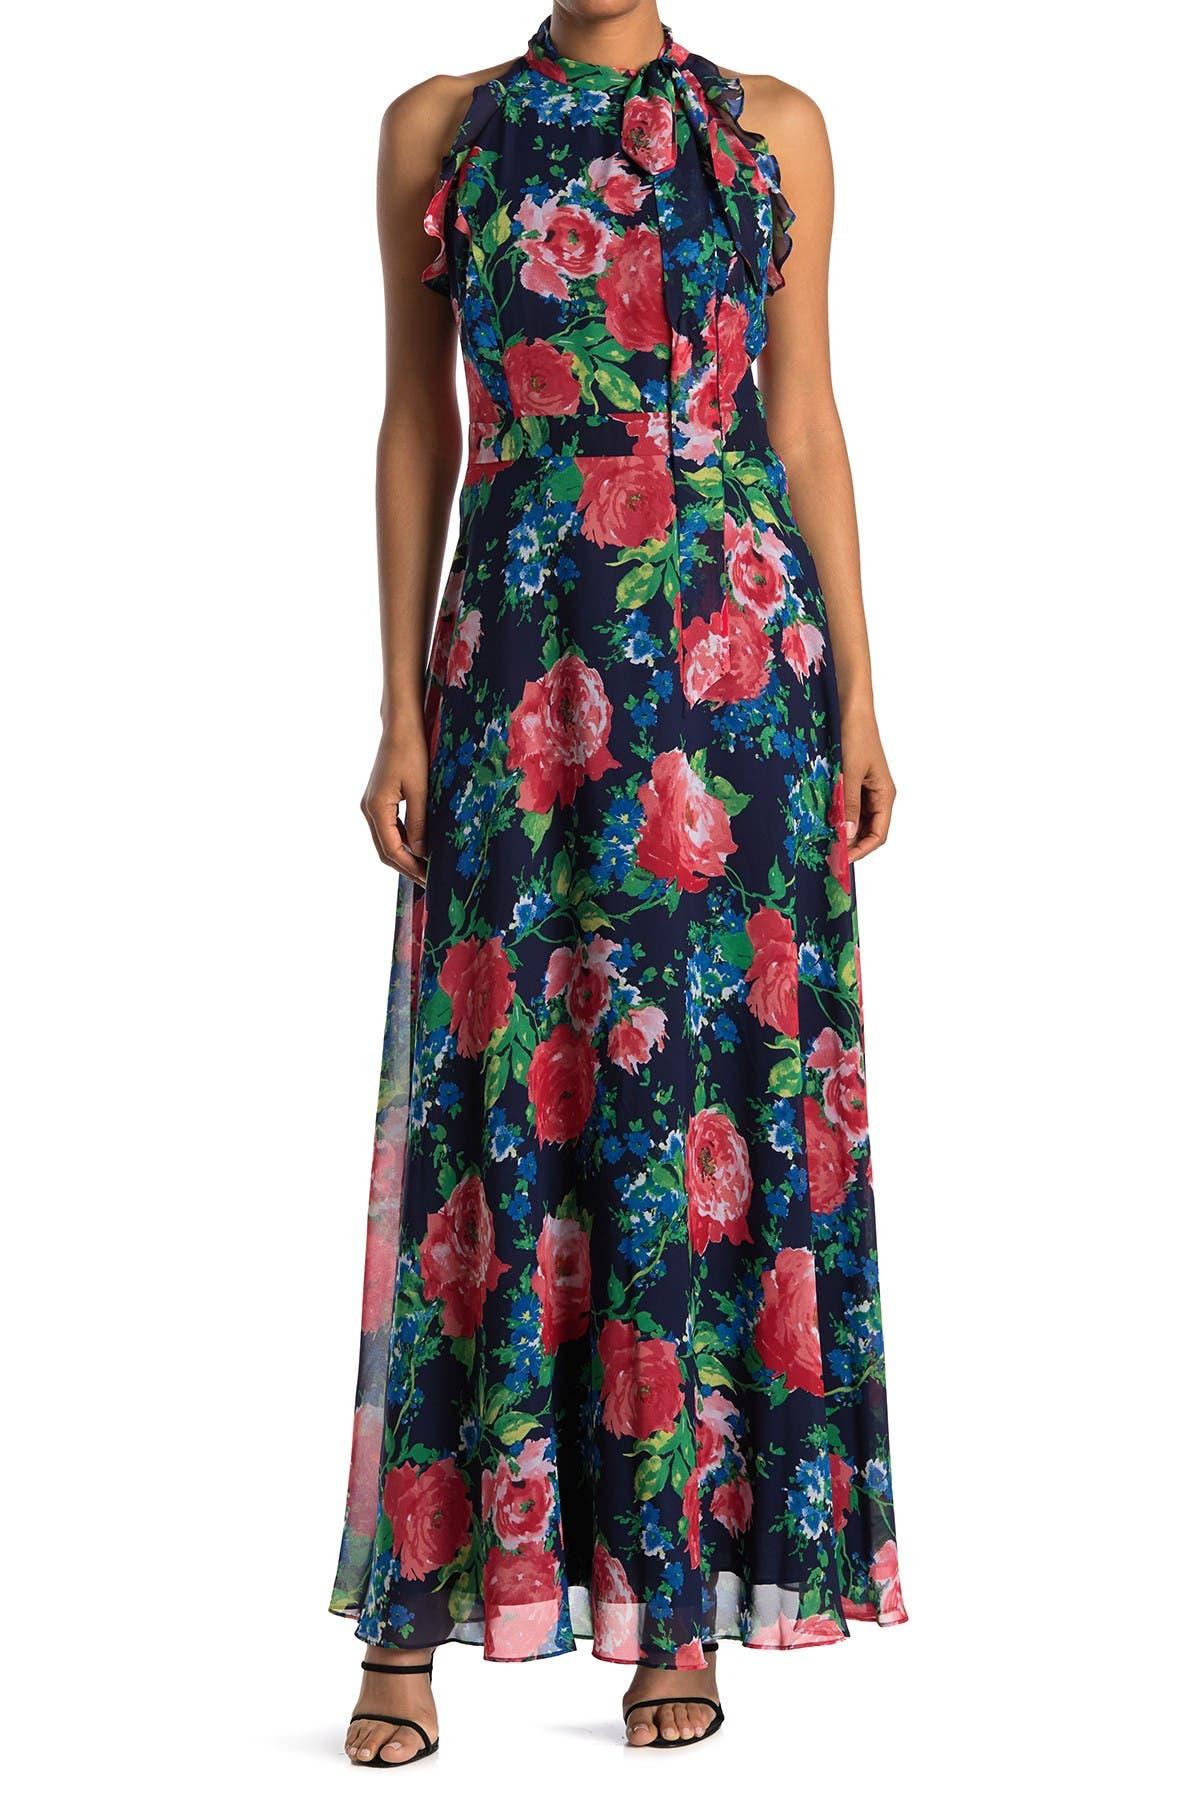 Image of Tahari Floral Halter Tie Neck Sleeveless Chiffon Maxi Dress